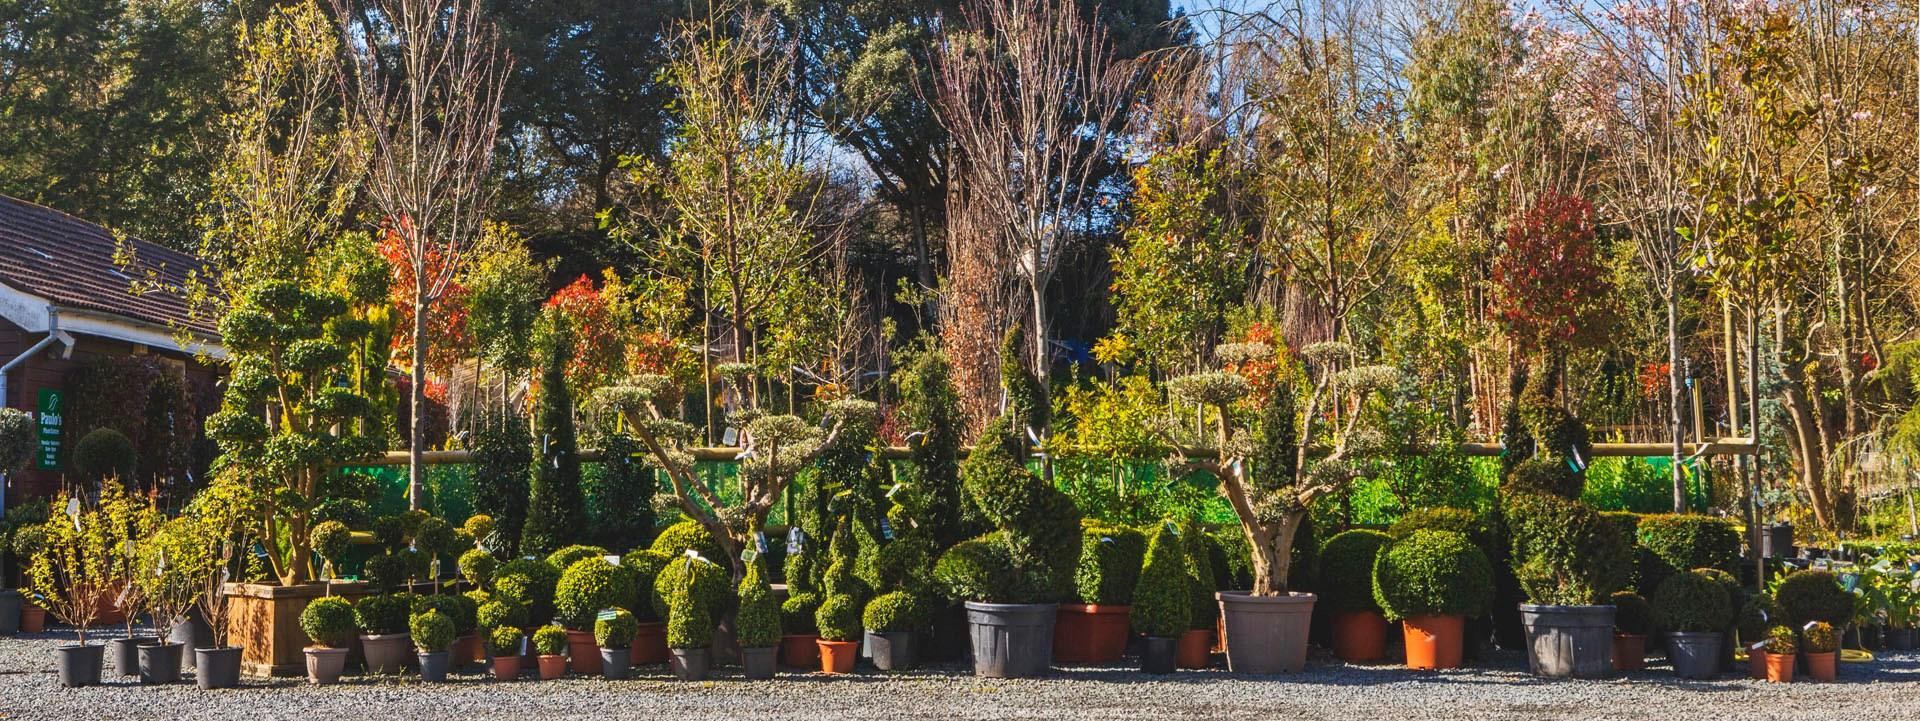 Paulo\'s | Plant Centre & Gardening Works Ltd